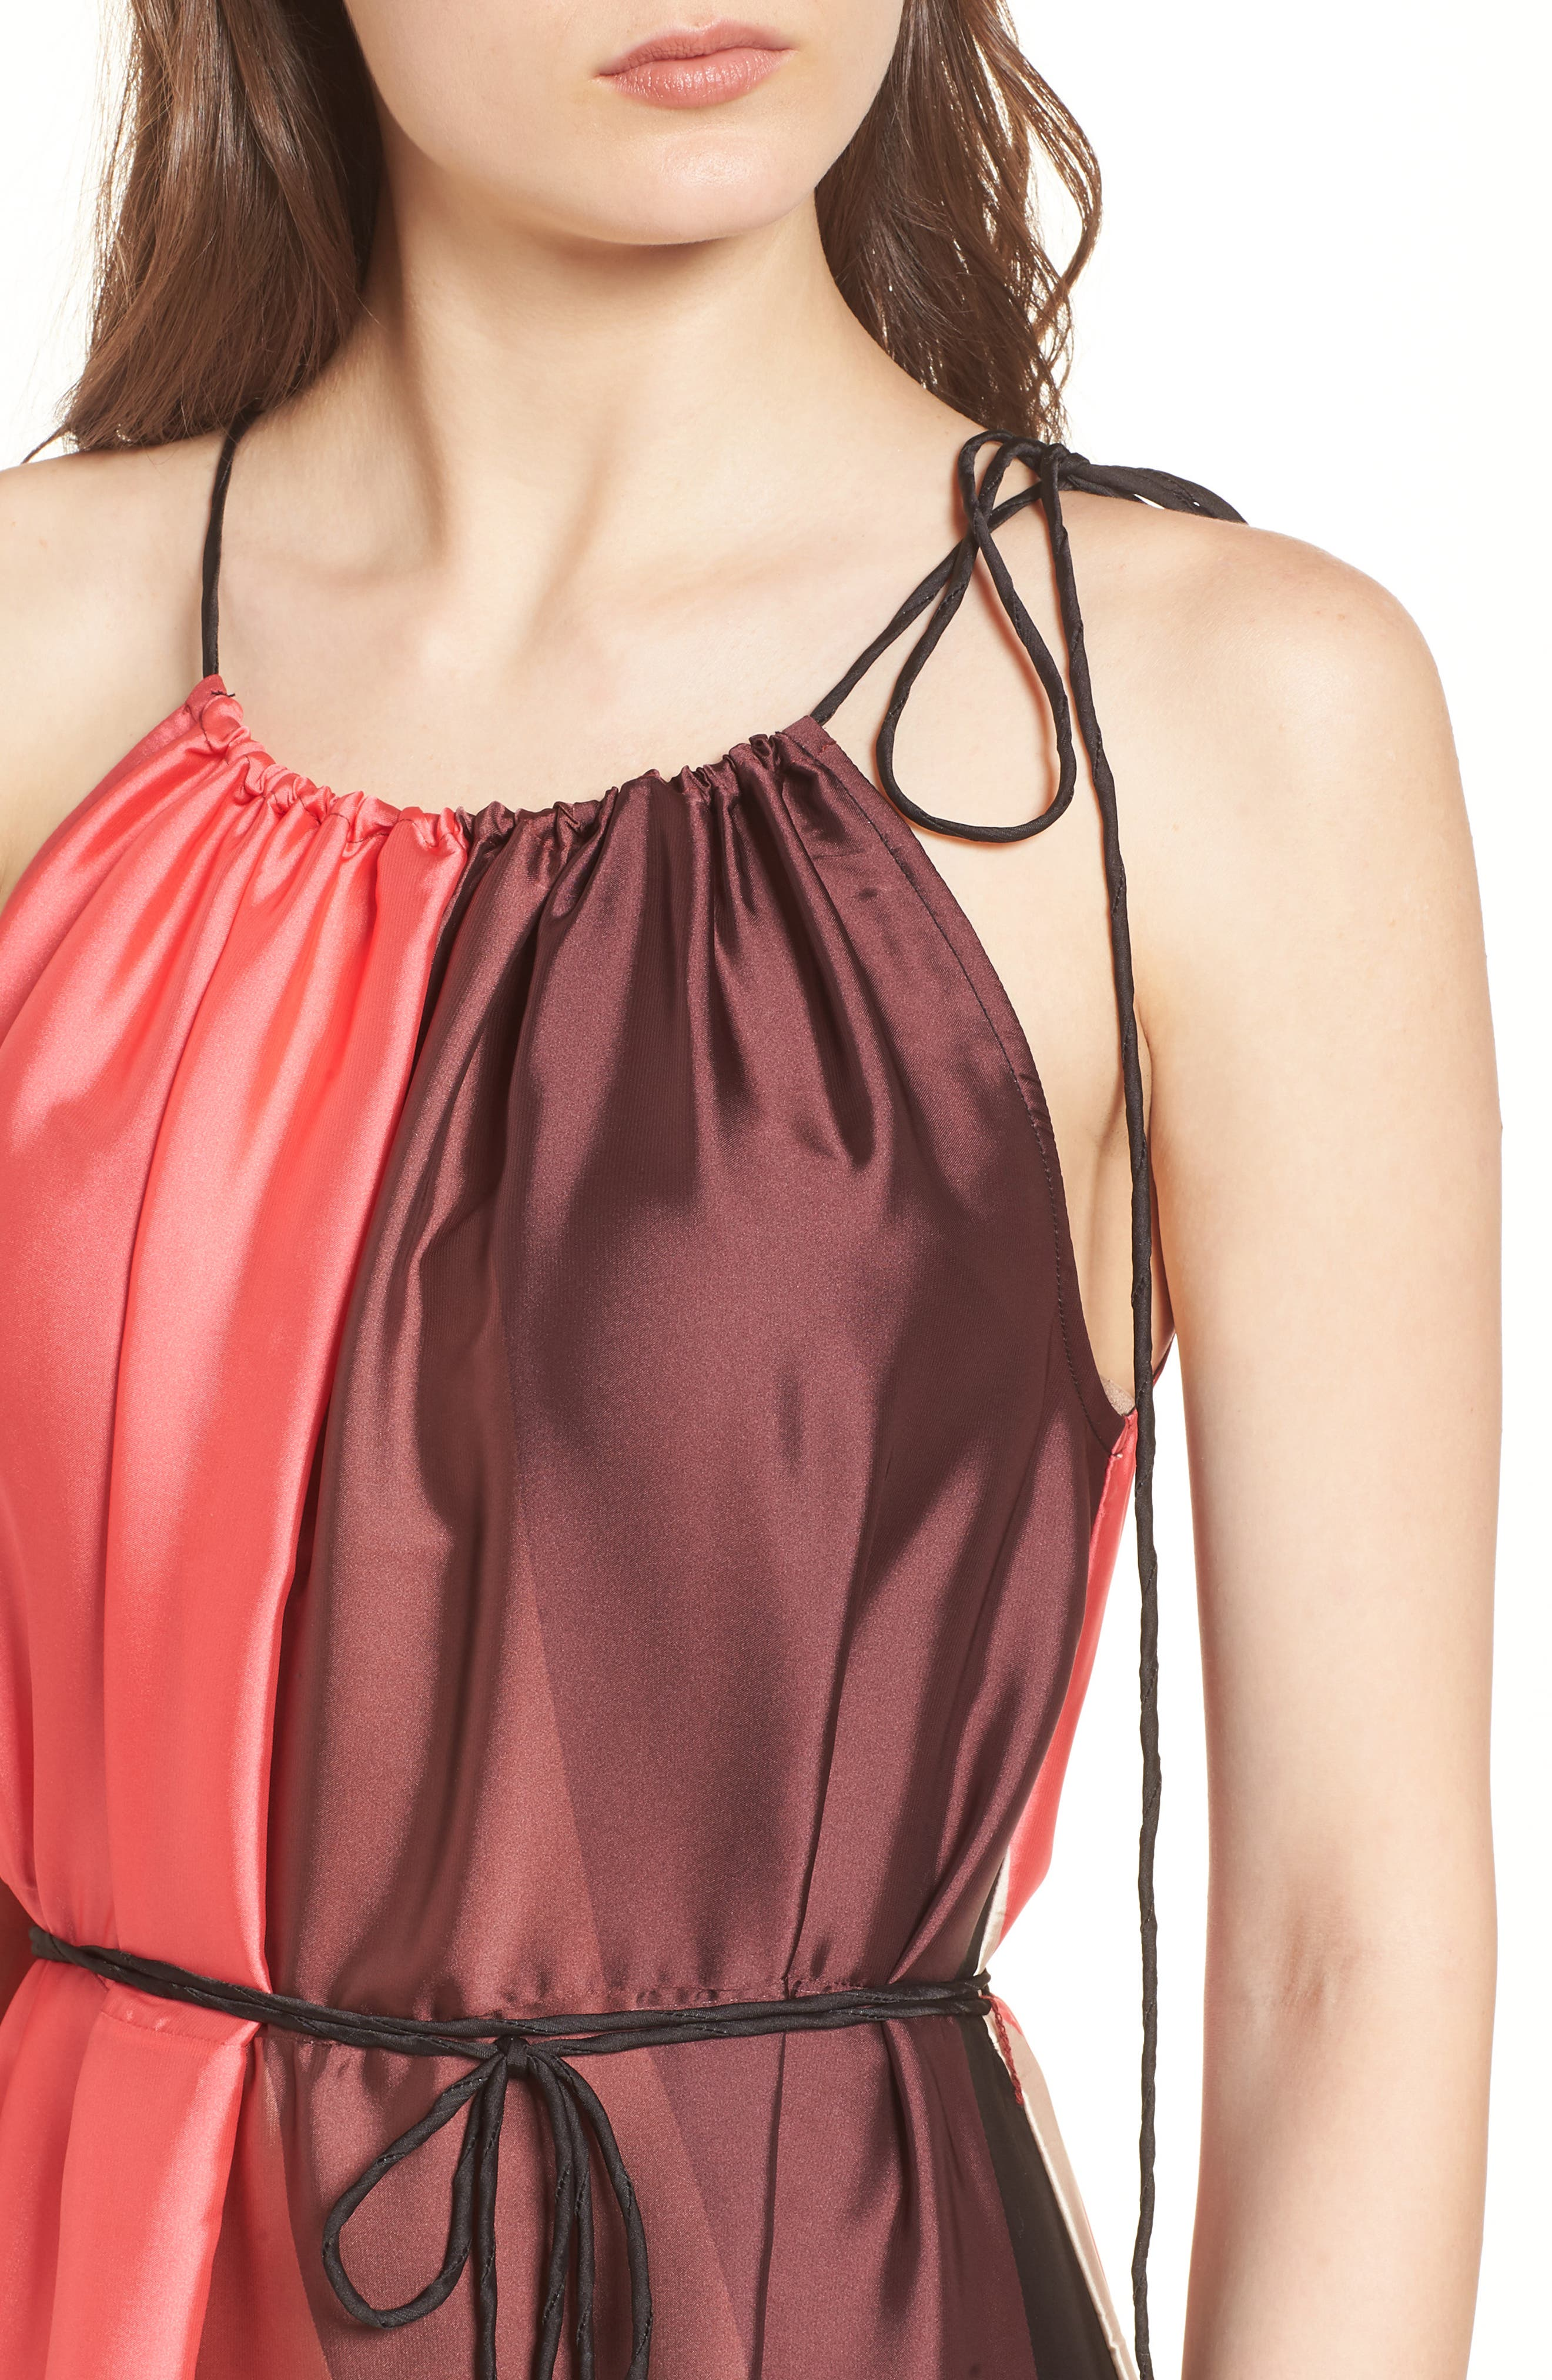 Icy Shores Maxi Dress,                             Alternate thumbnail 4, color,                             Multi